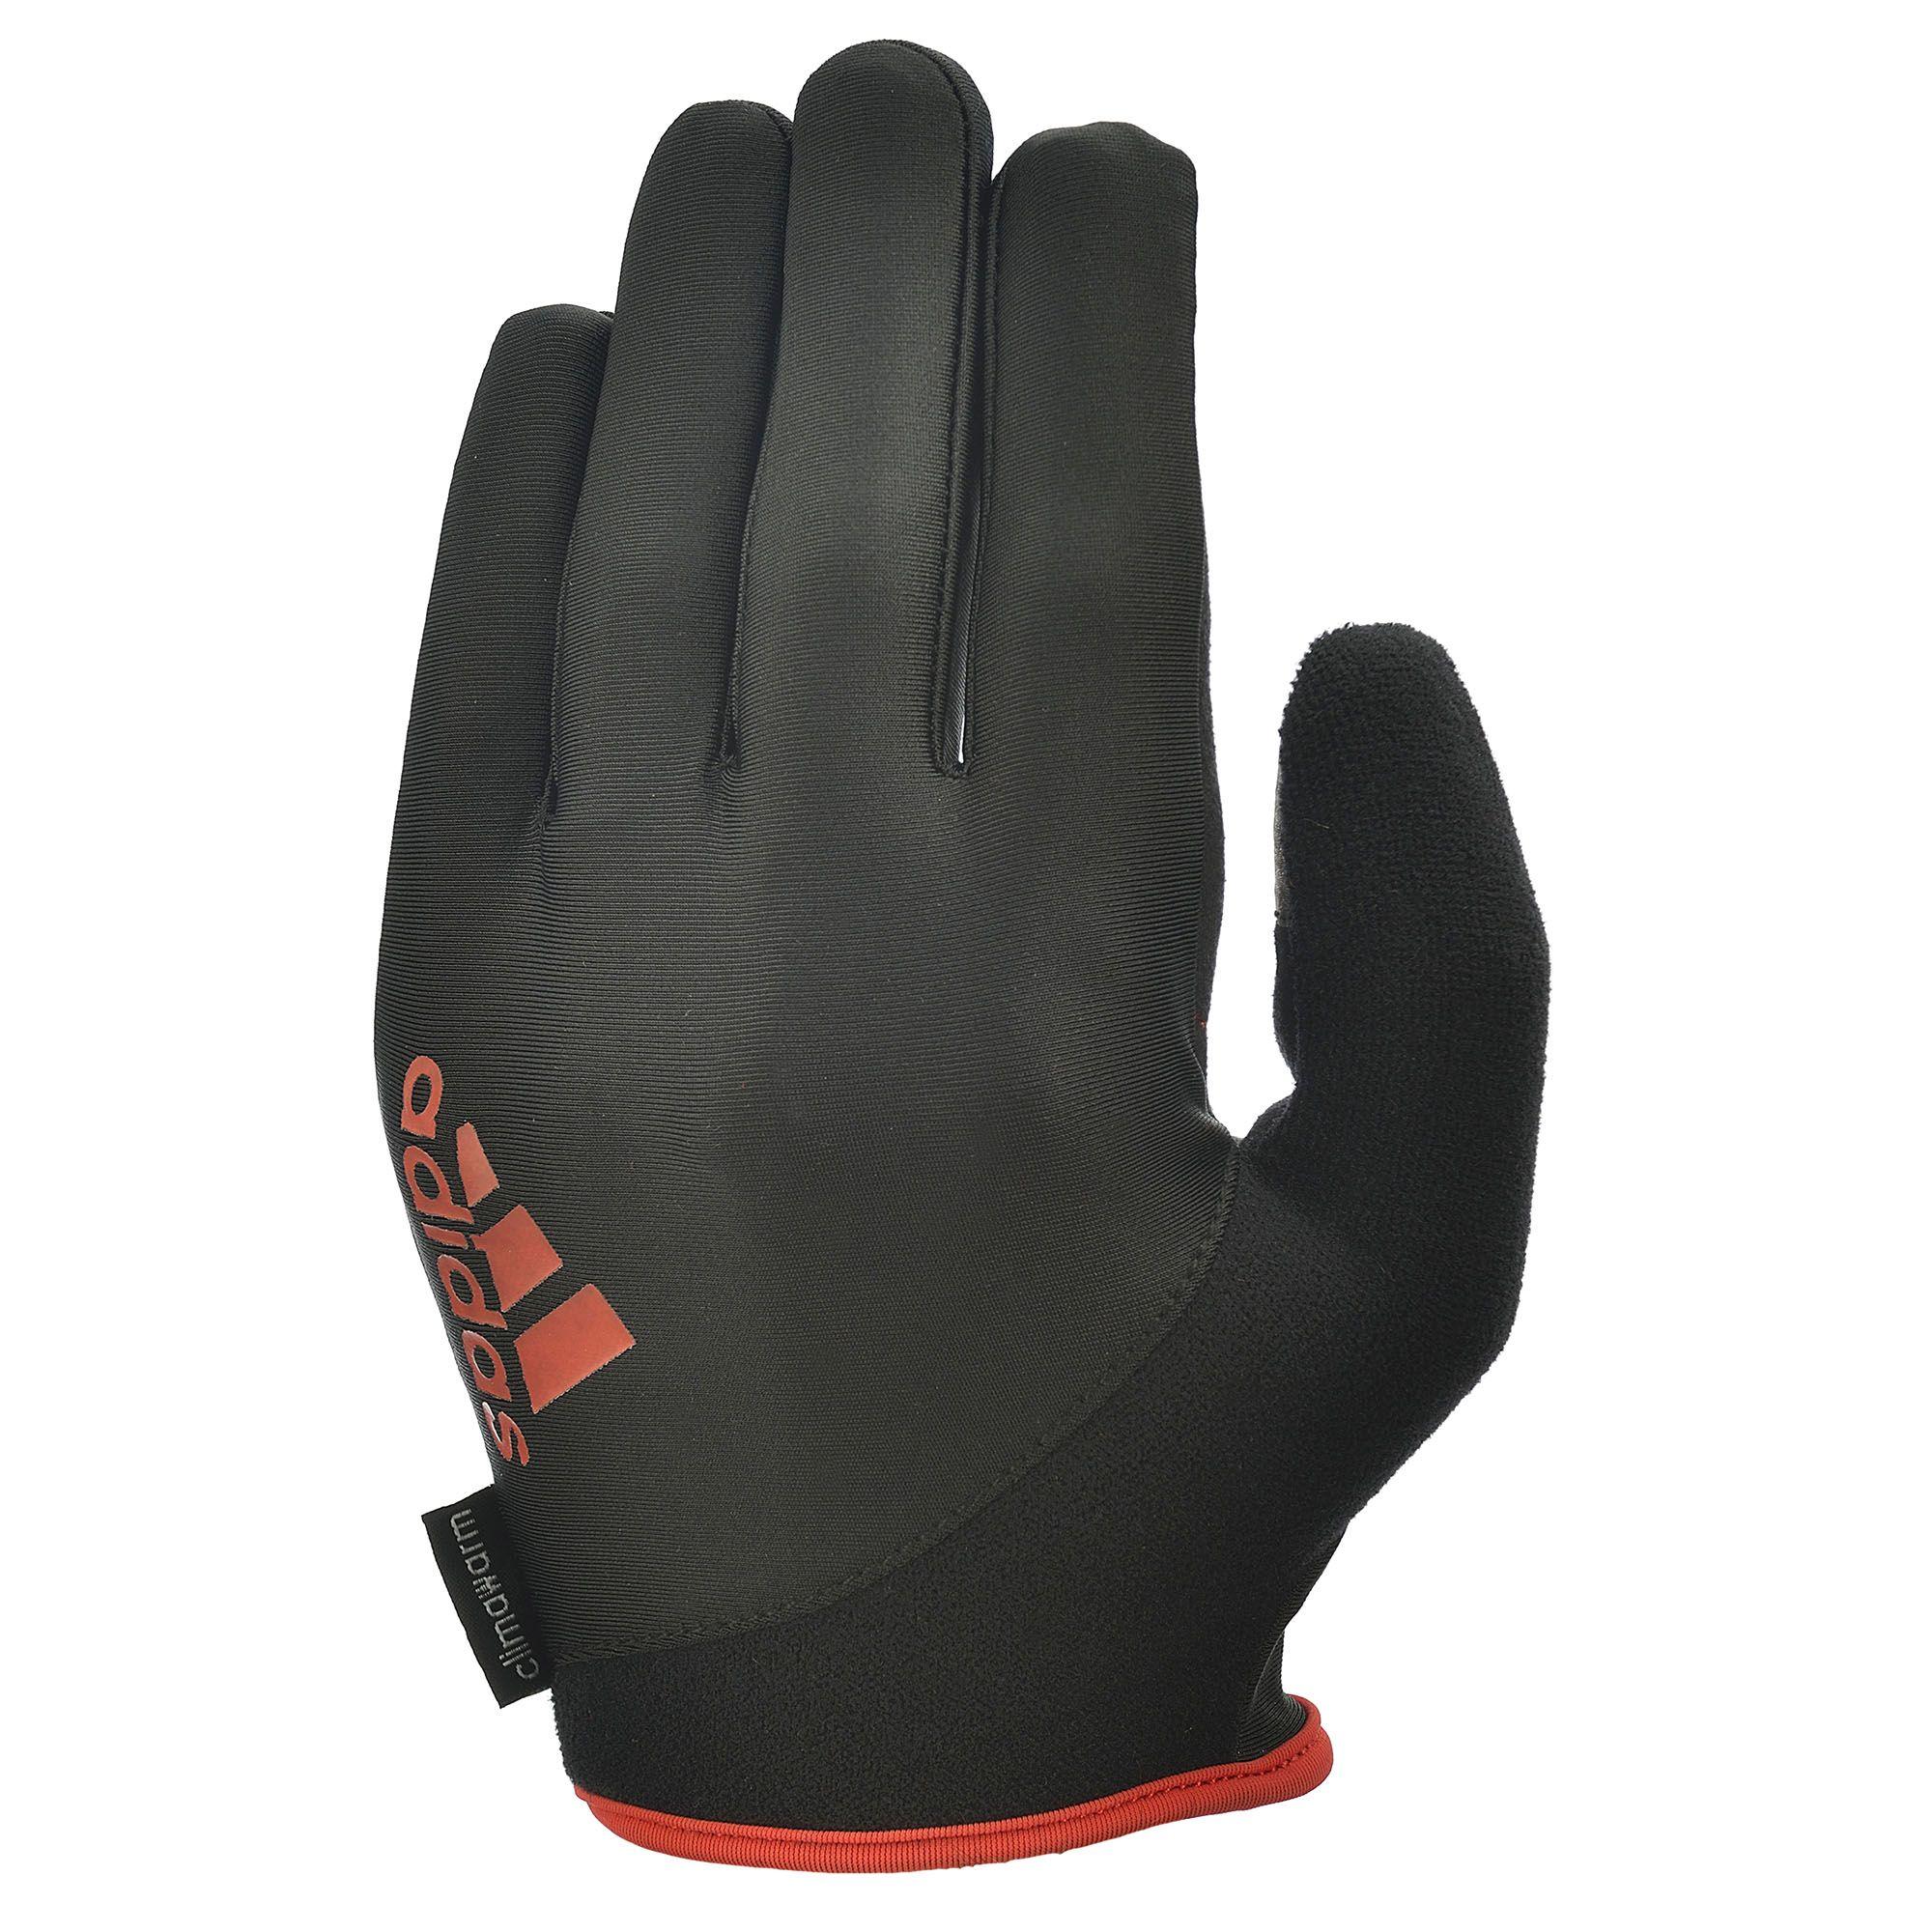 Adidas Essential Full Finger Gloves Sweatband Com